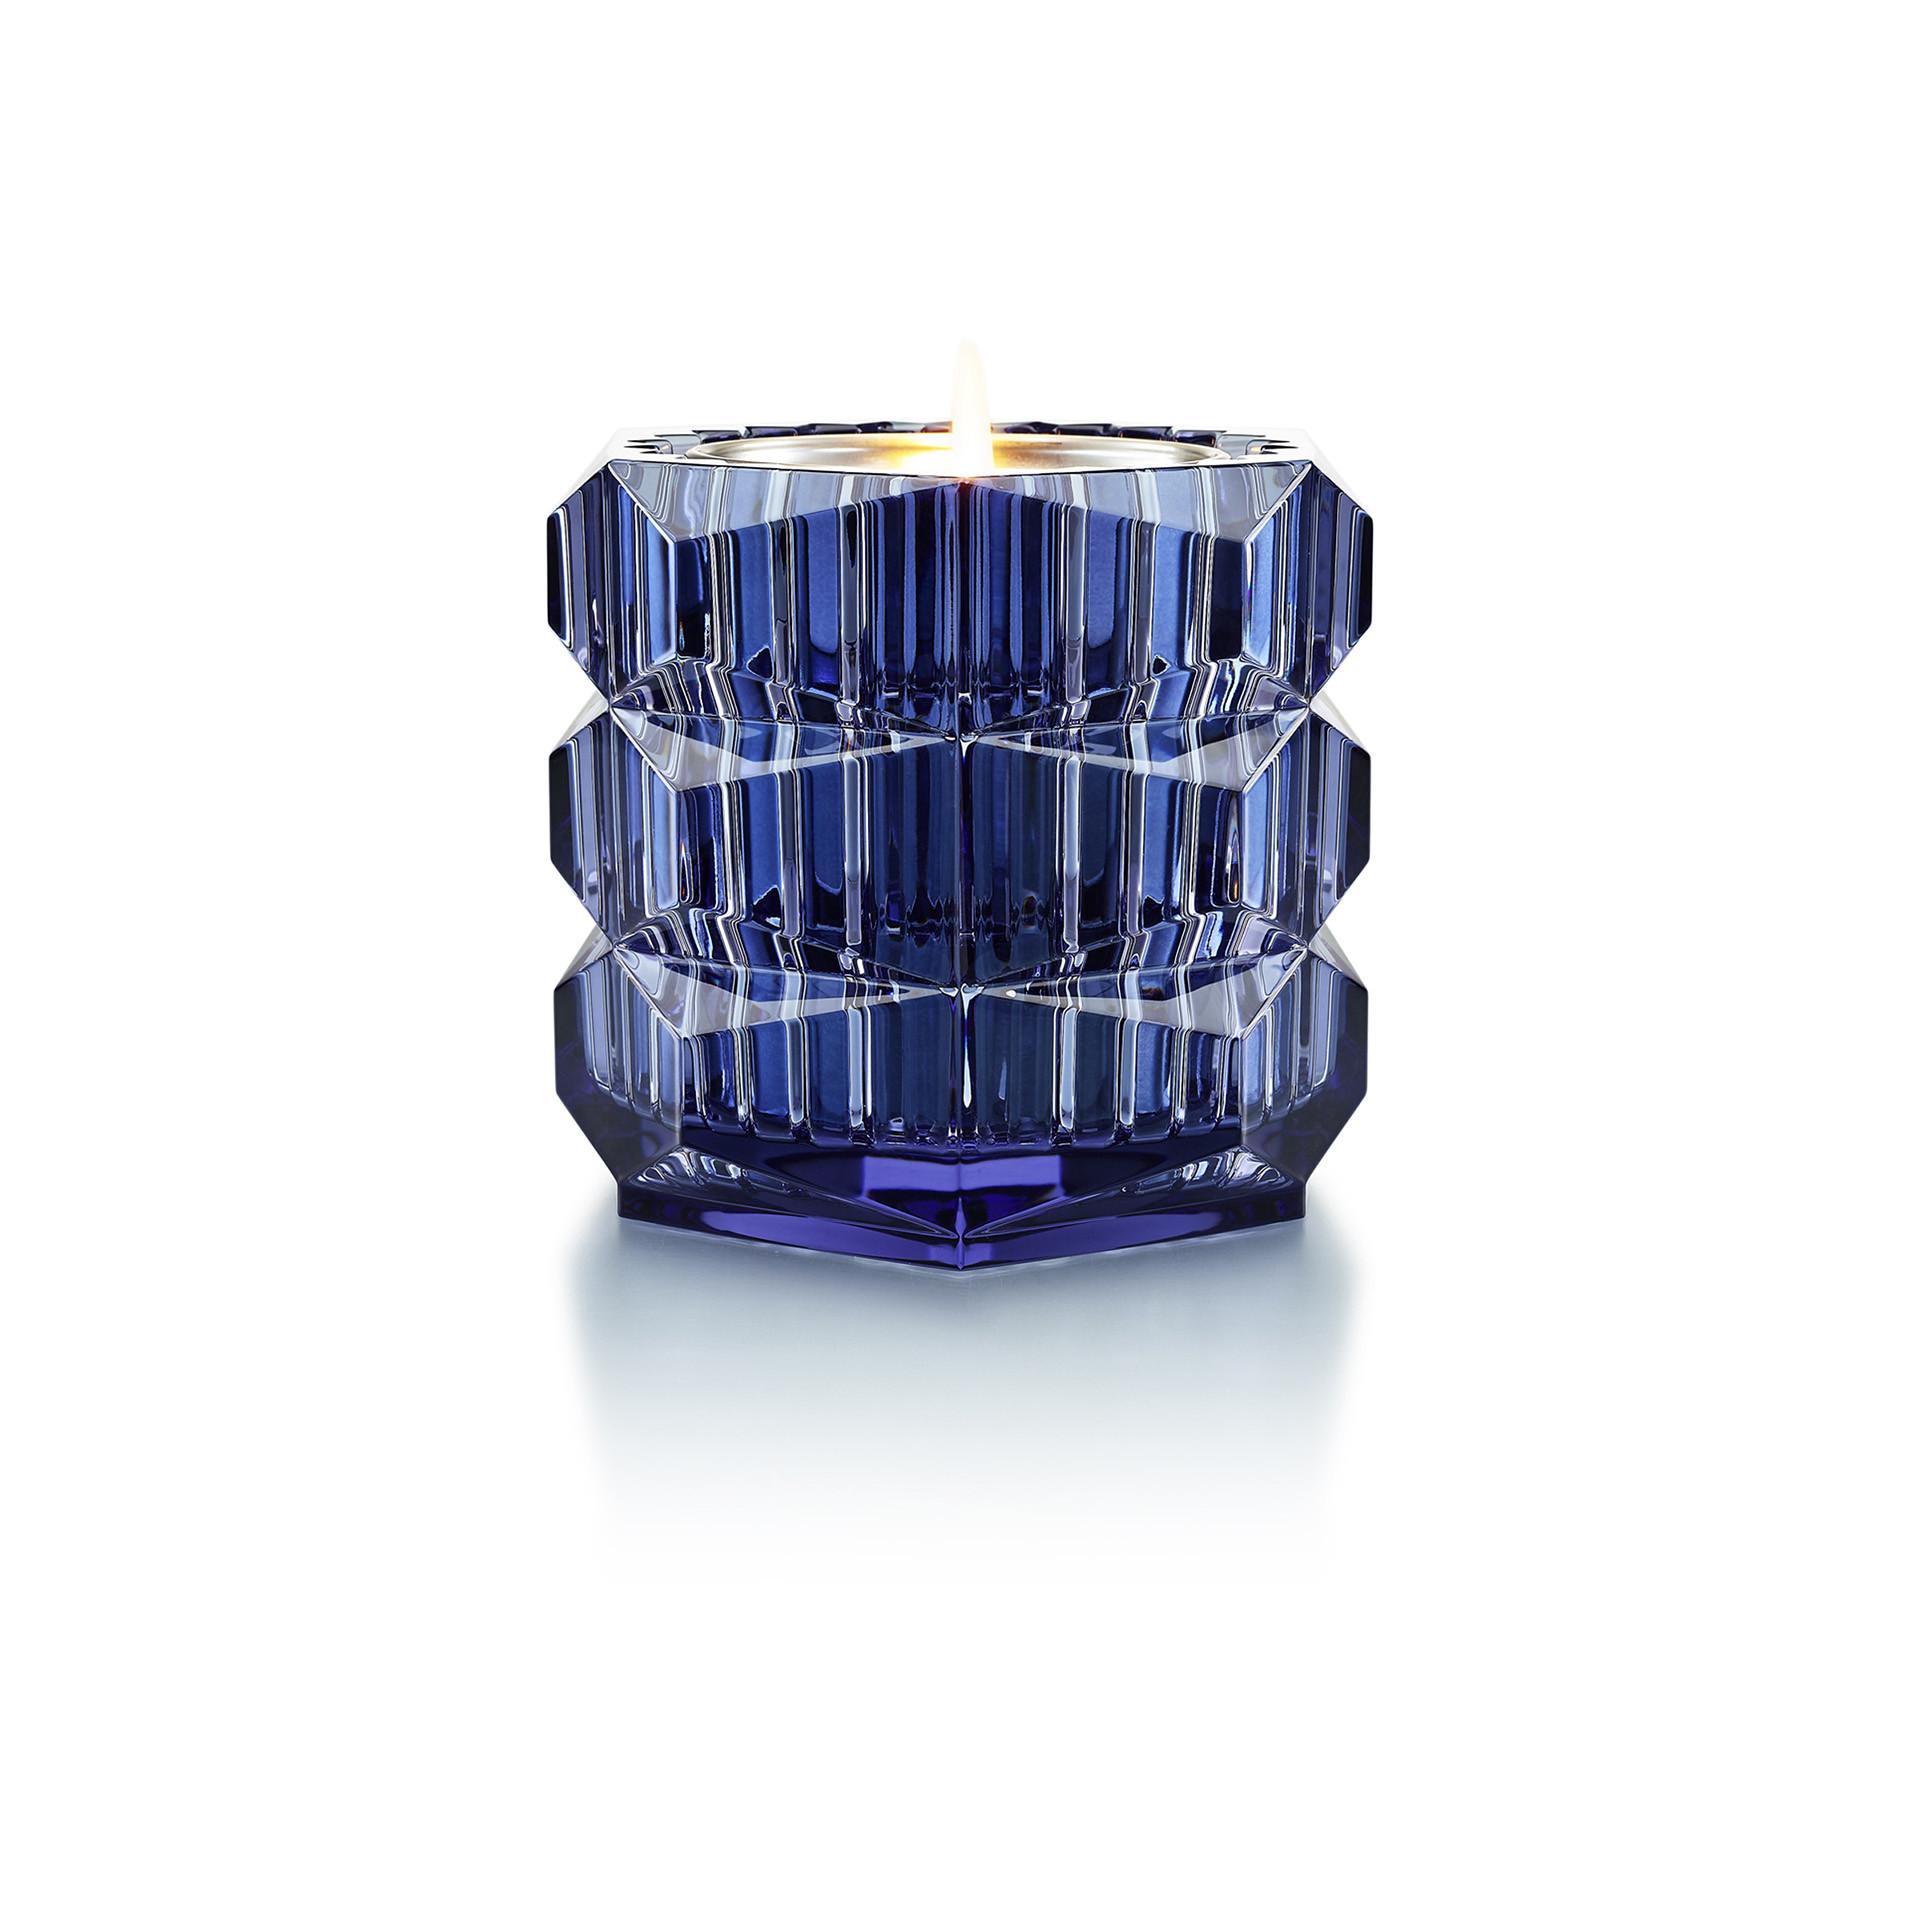 baccarat louxor vase of a‰clat de nuit candlestick baccarat in 2810942